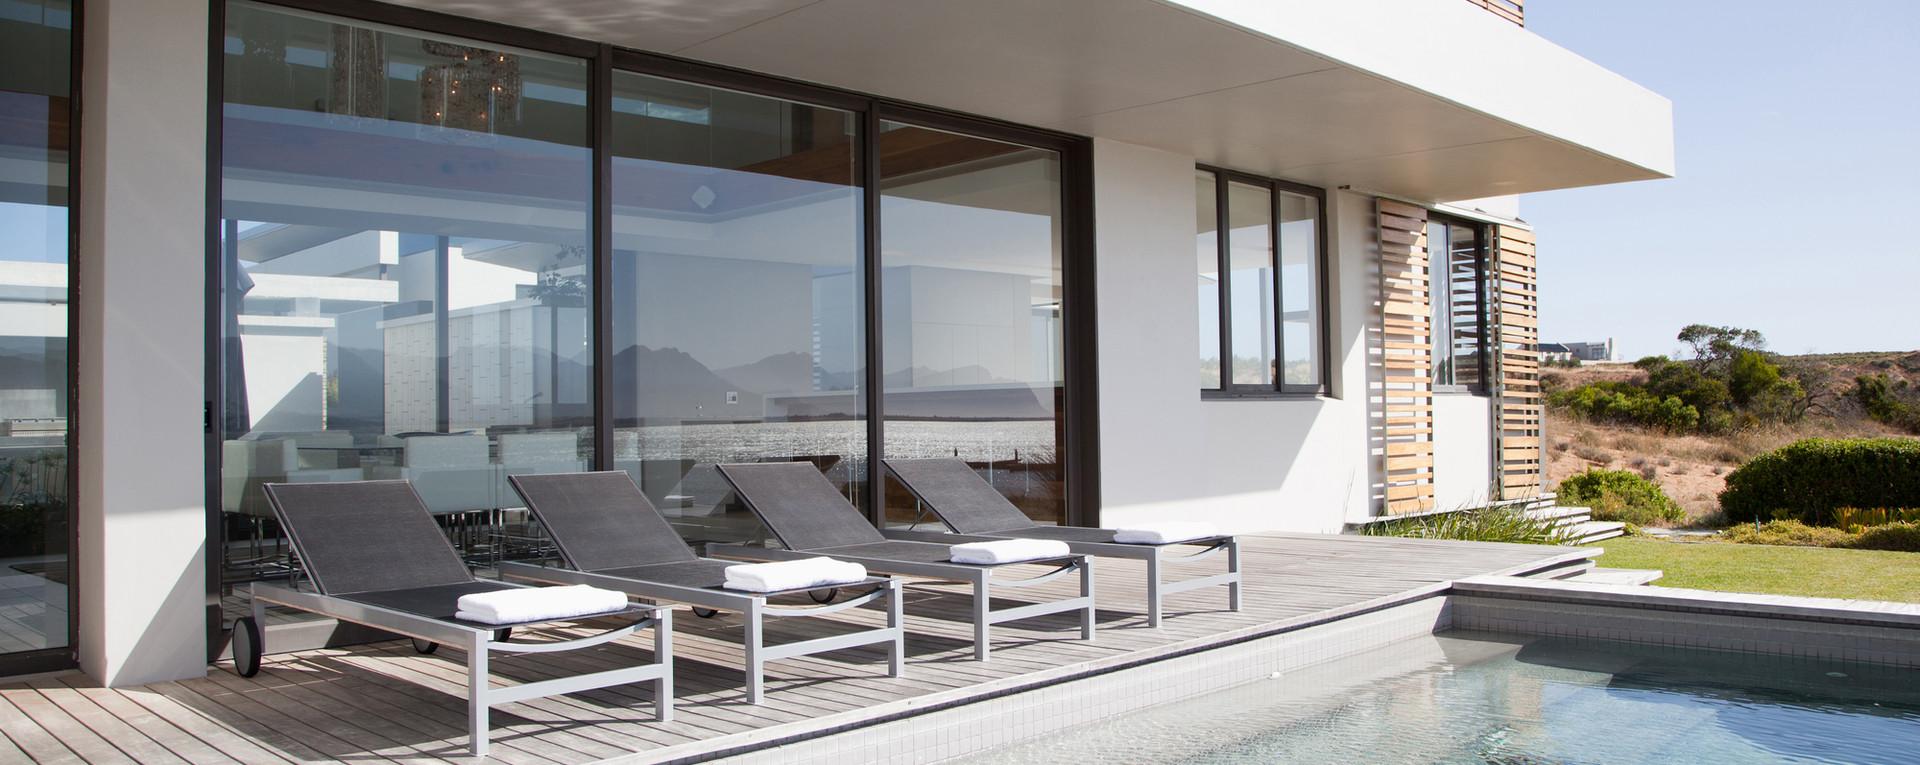 Villa Pool